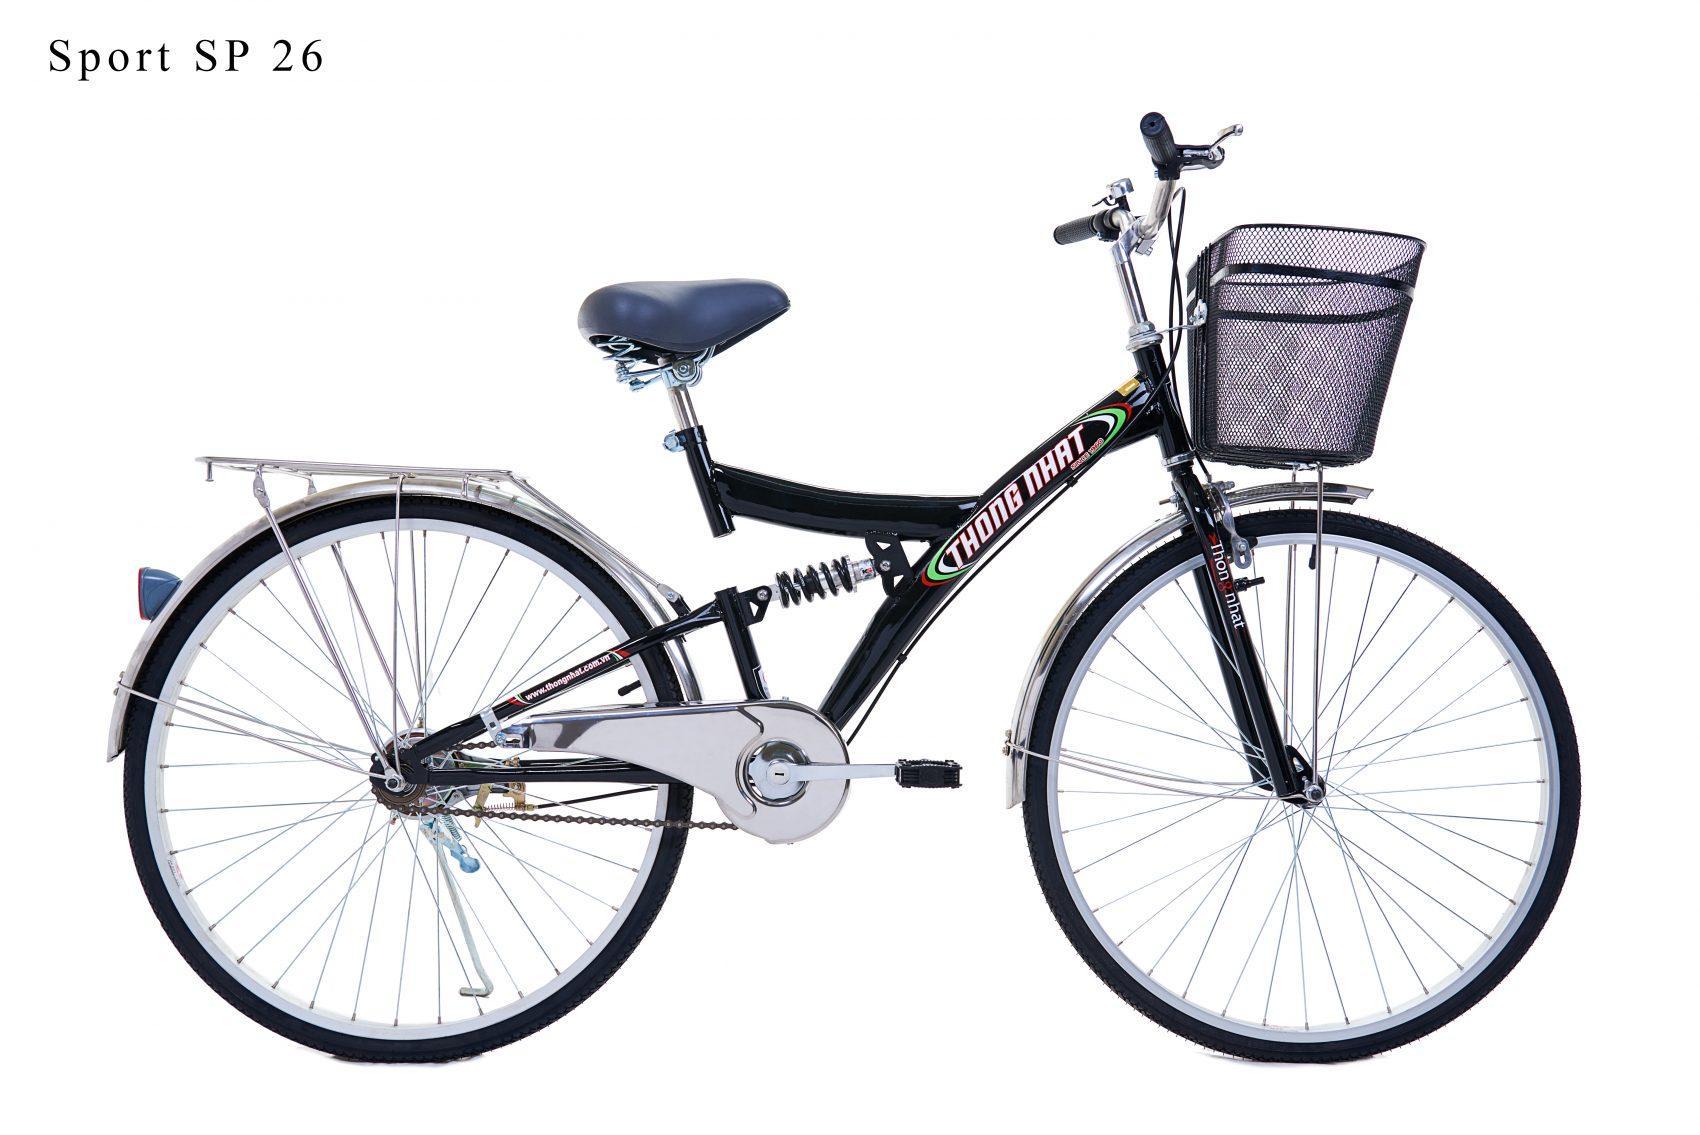 Xe đạp TN Sport Spring cỡ 26(TN Sport SP 26)